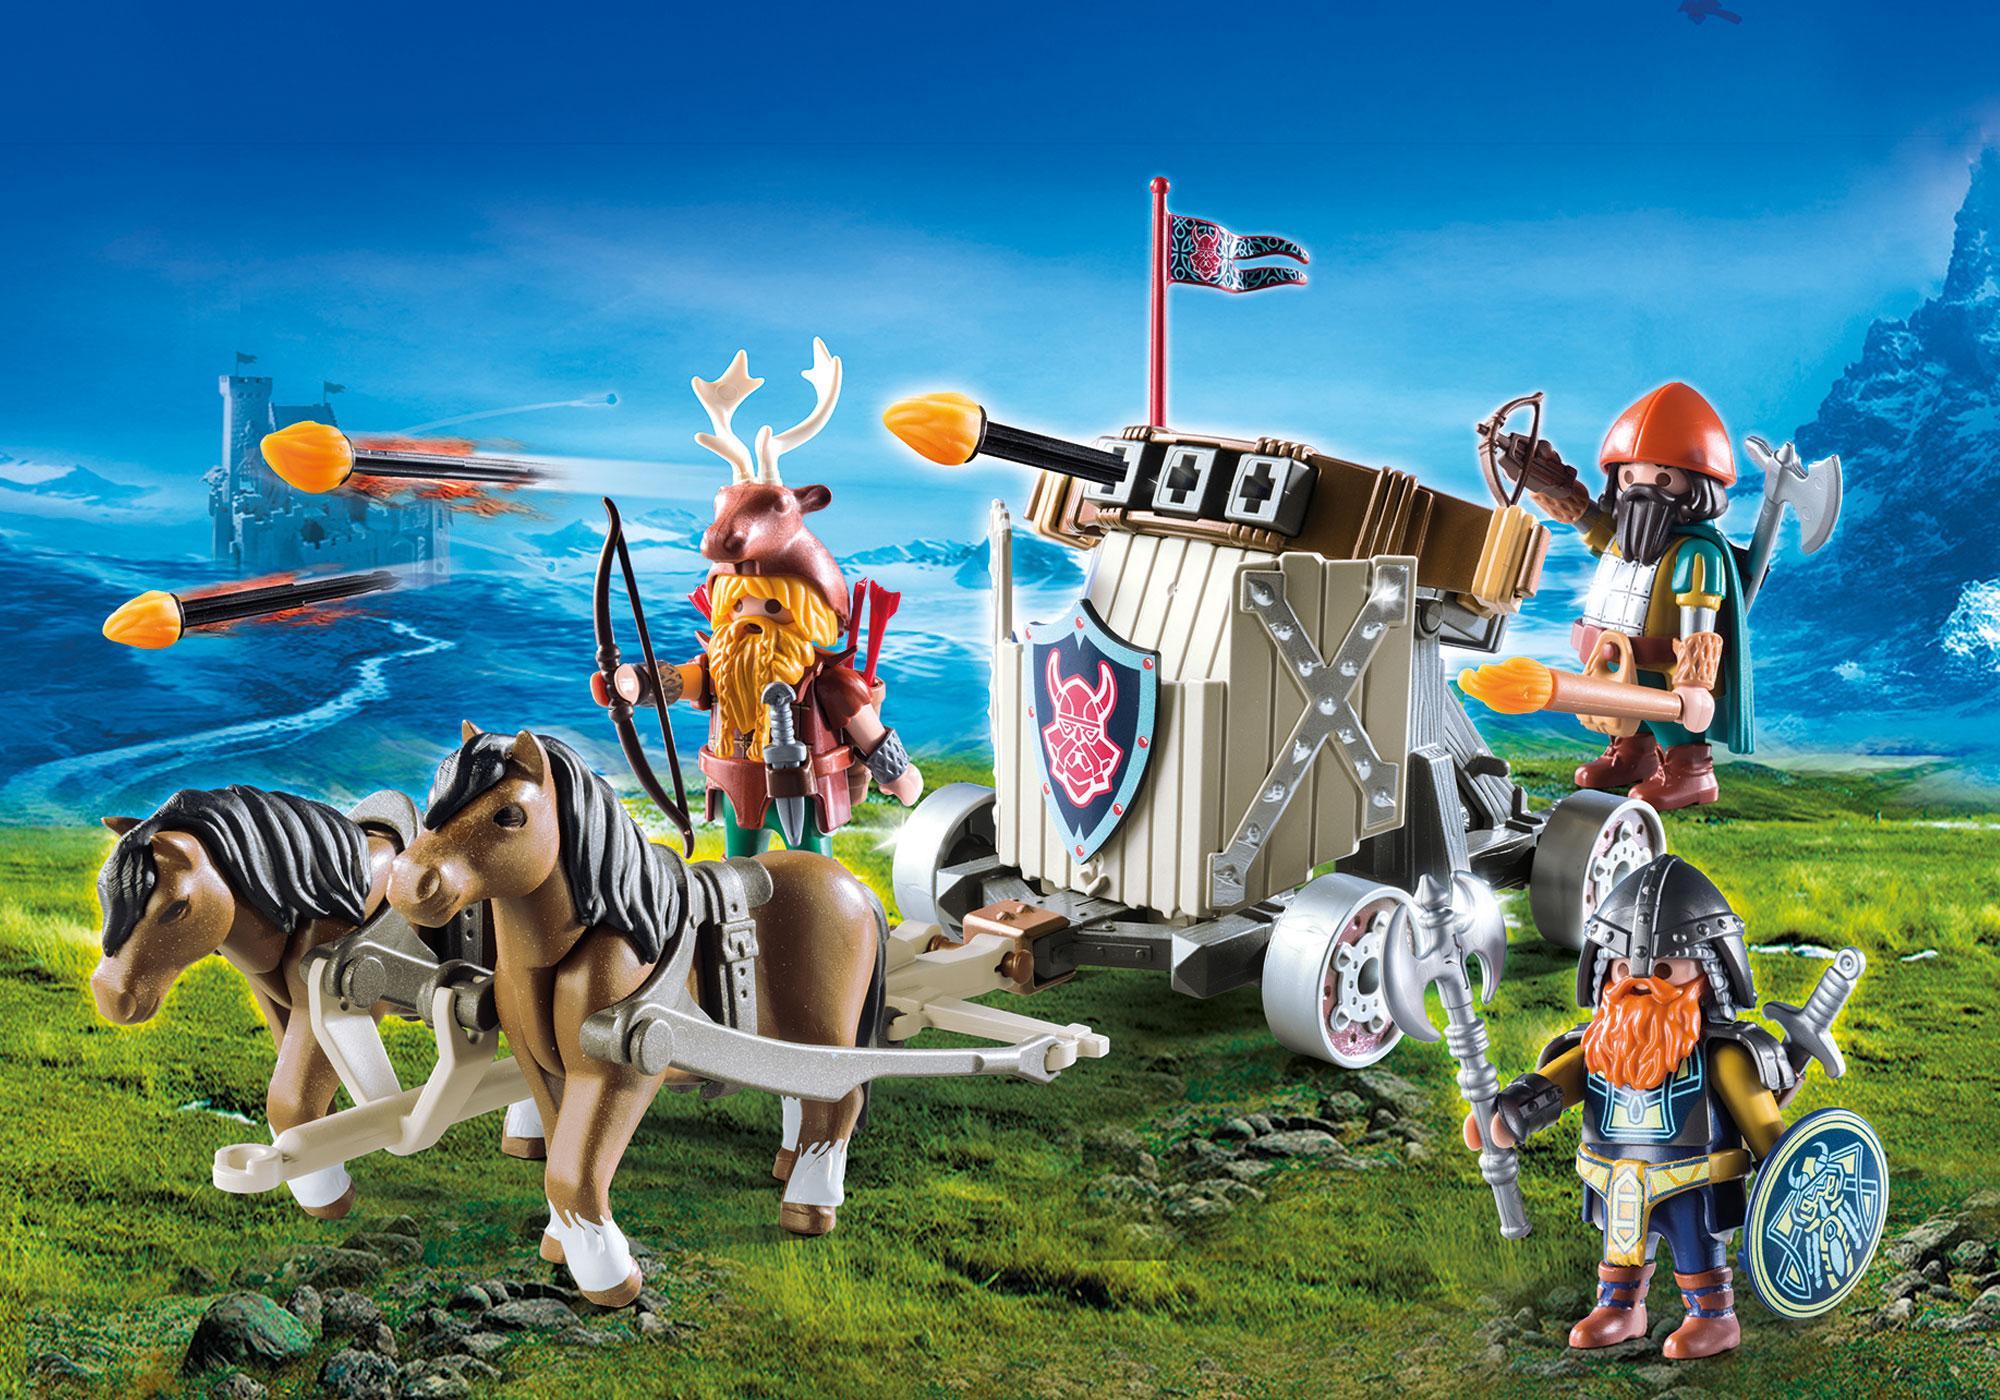 http://media.playmobil.com/i/playmobil/9341_product_detail/Char de combat avec baliste et nains